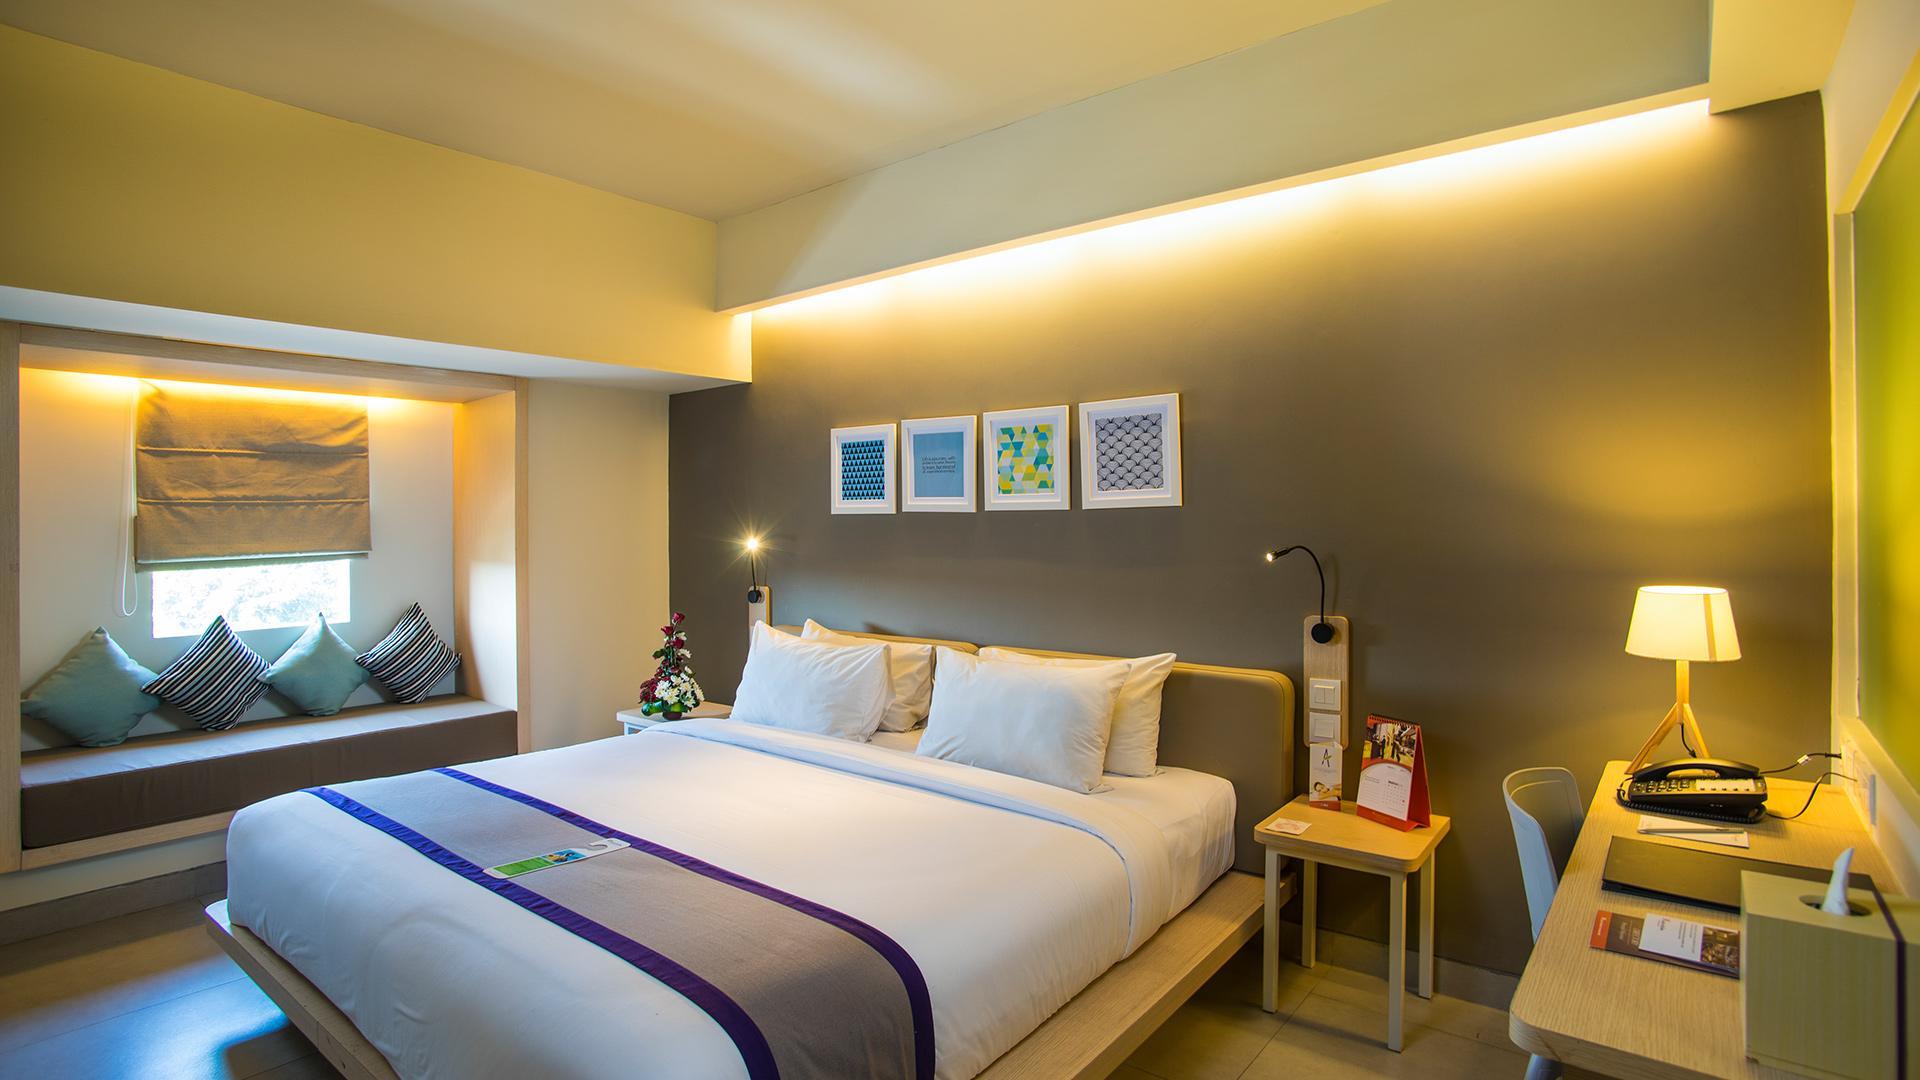 Deluxe Room image 1 at Swiss-Belinn Legian by Kabupaten Badung, Bali, Indonesia